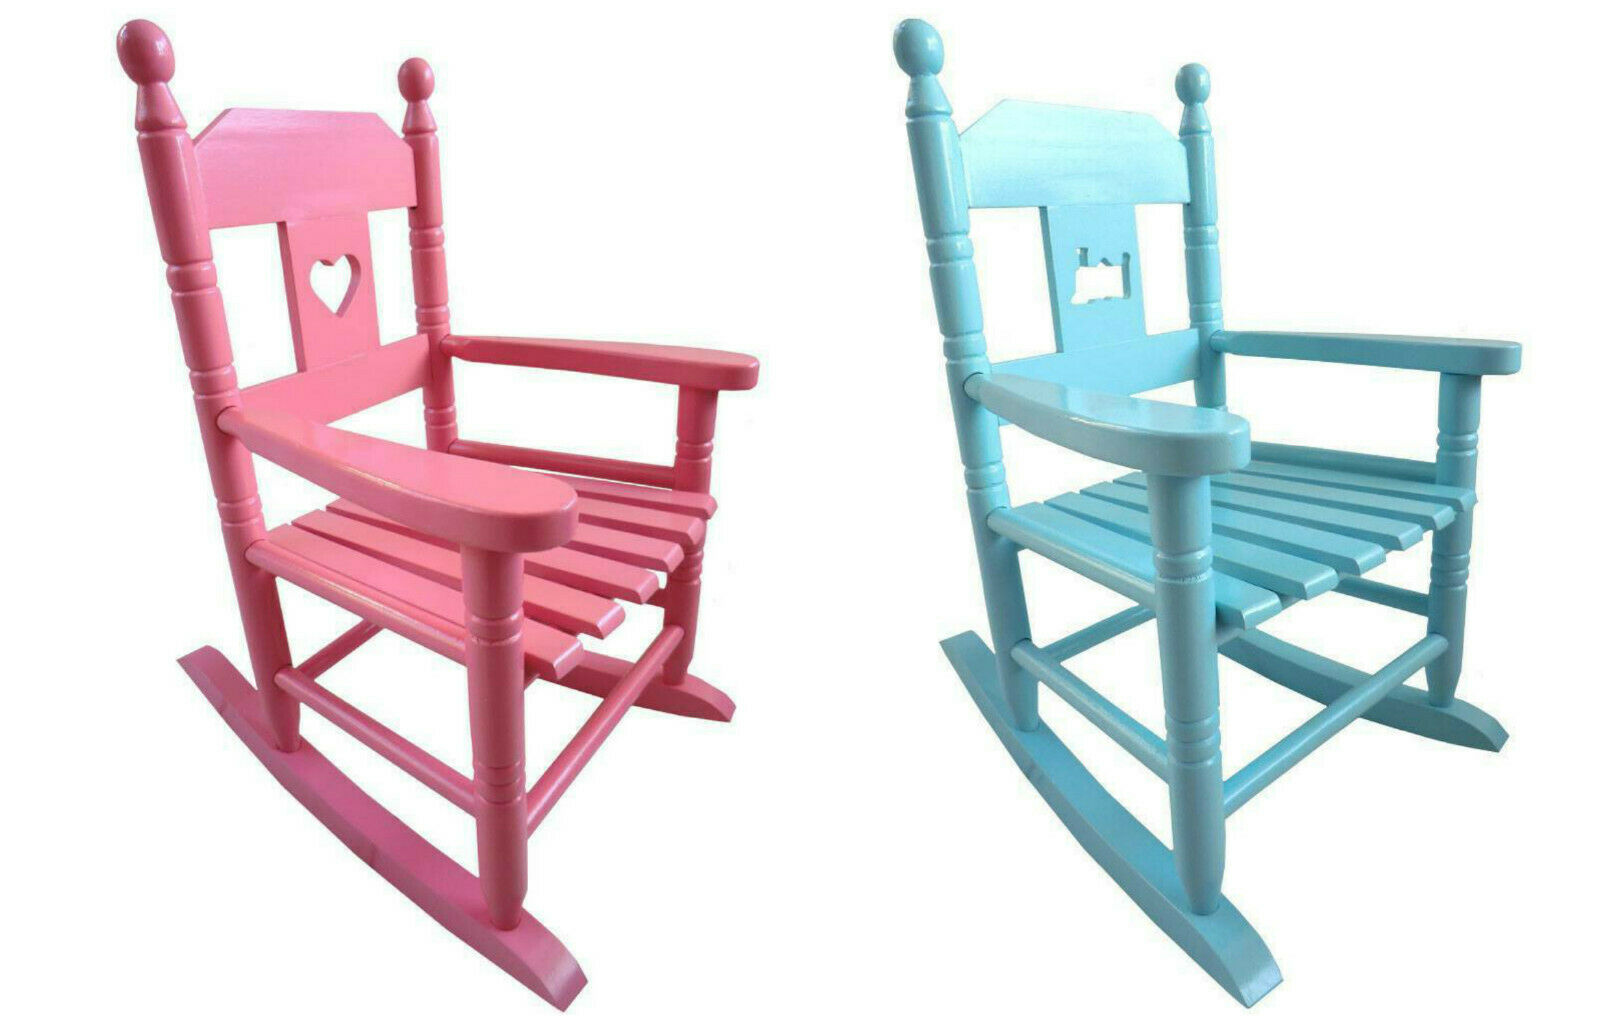 Kinder Schaukelstuhl Holz rosa pink blau hellblau Prinzessin Kinderzimmer Sessel